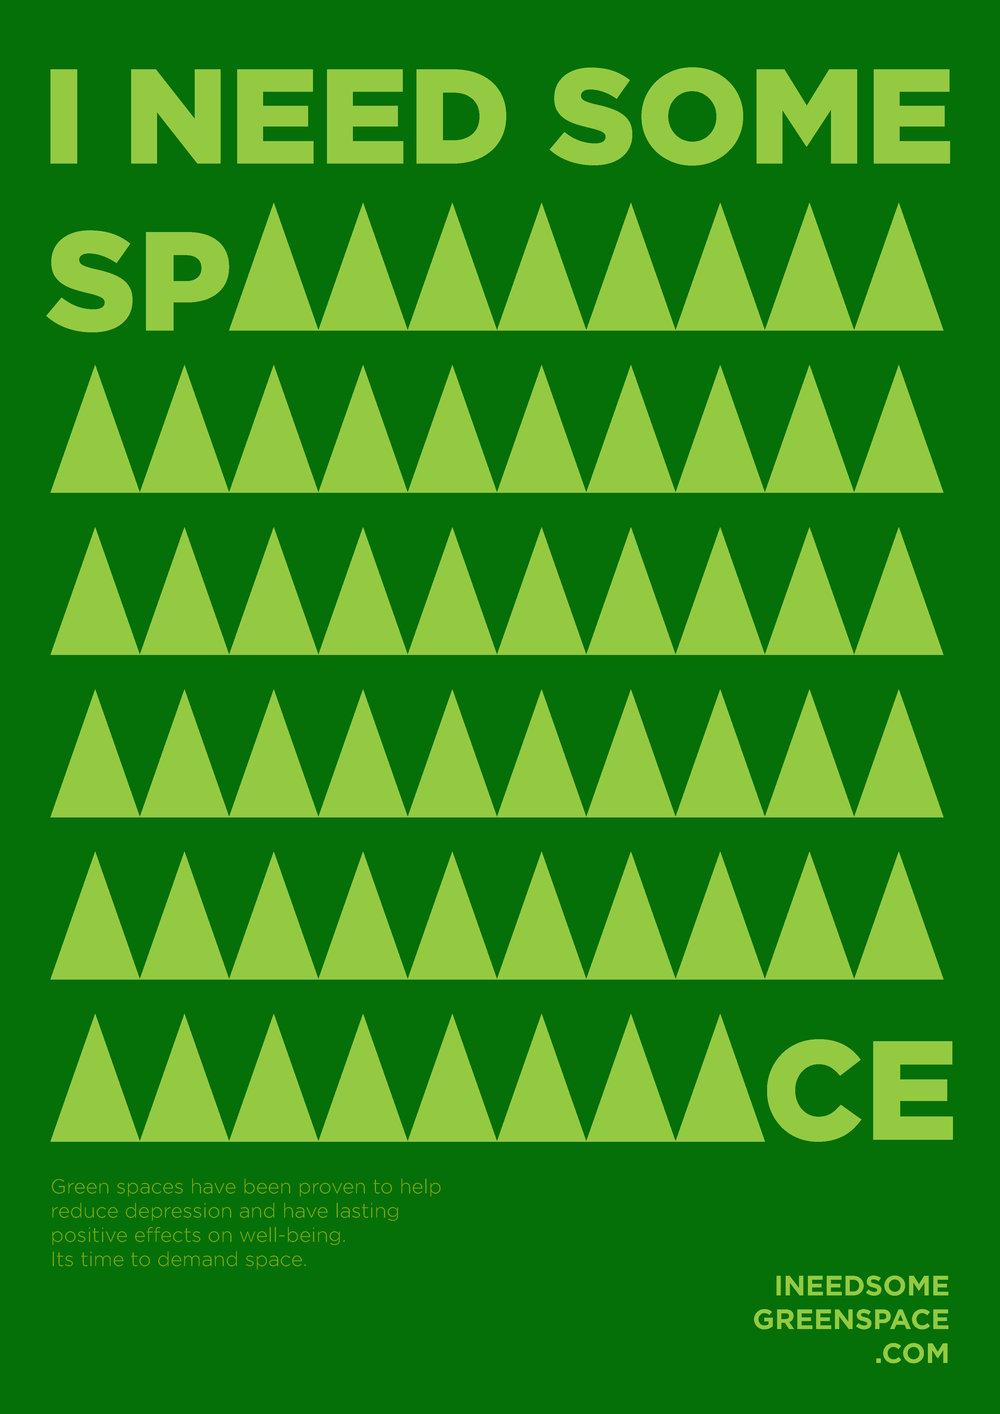 greenspace01